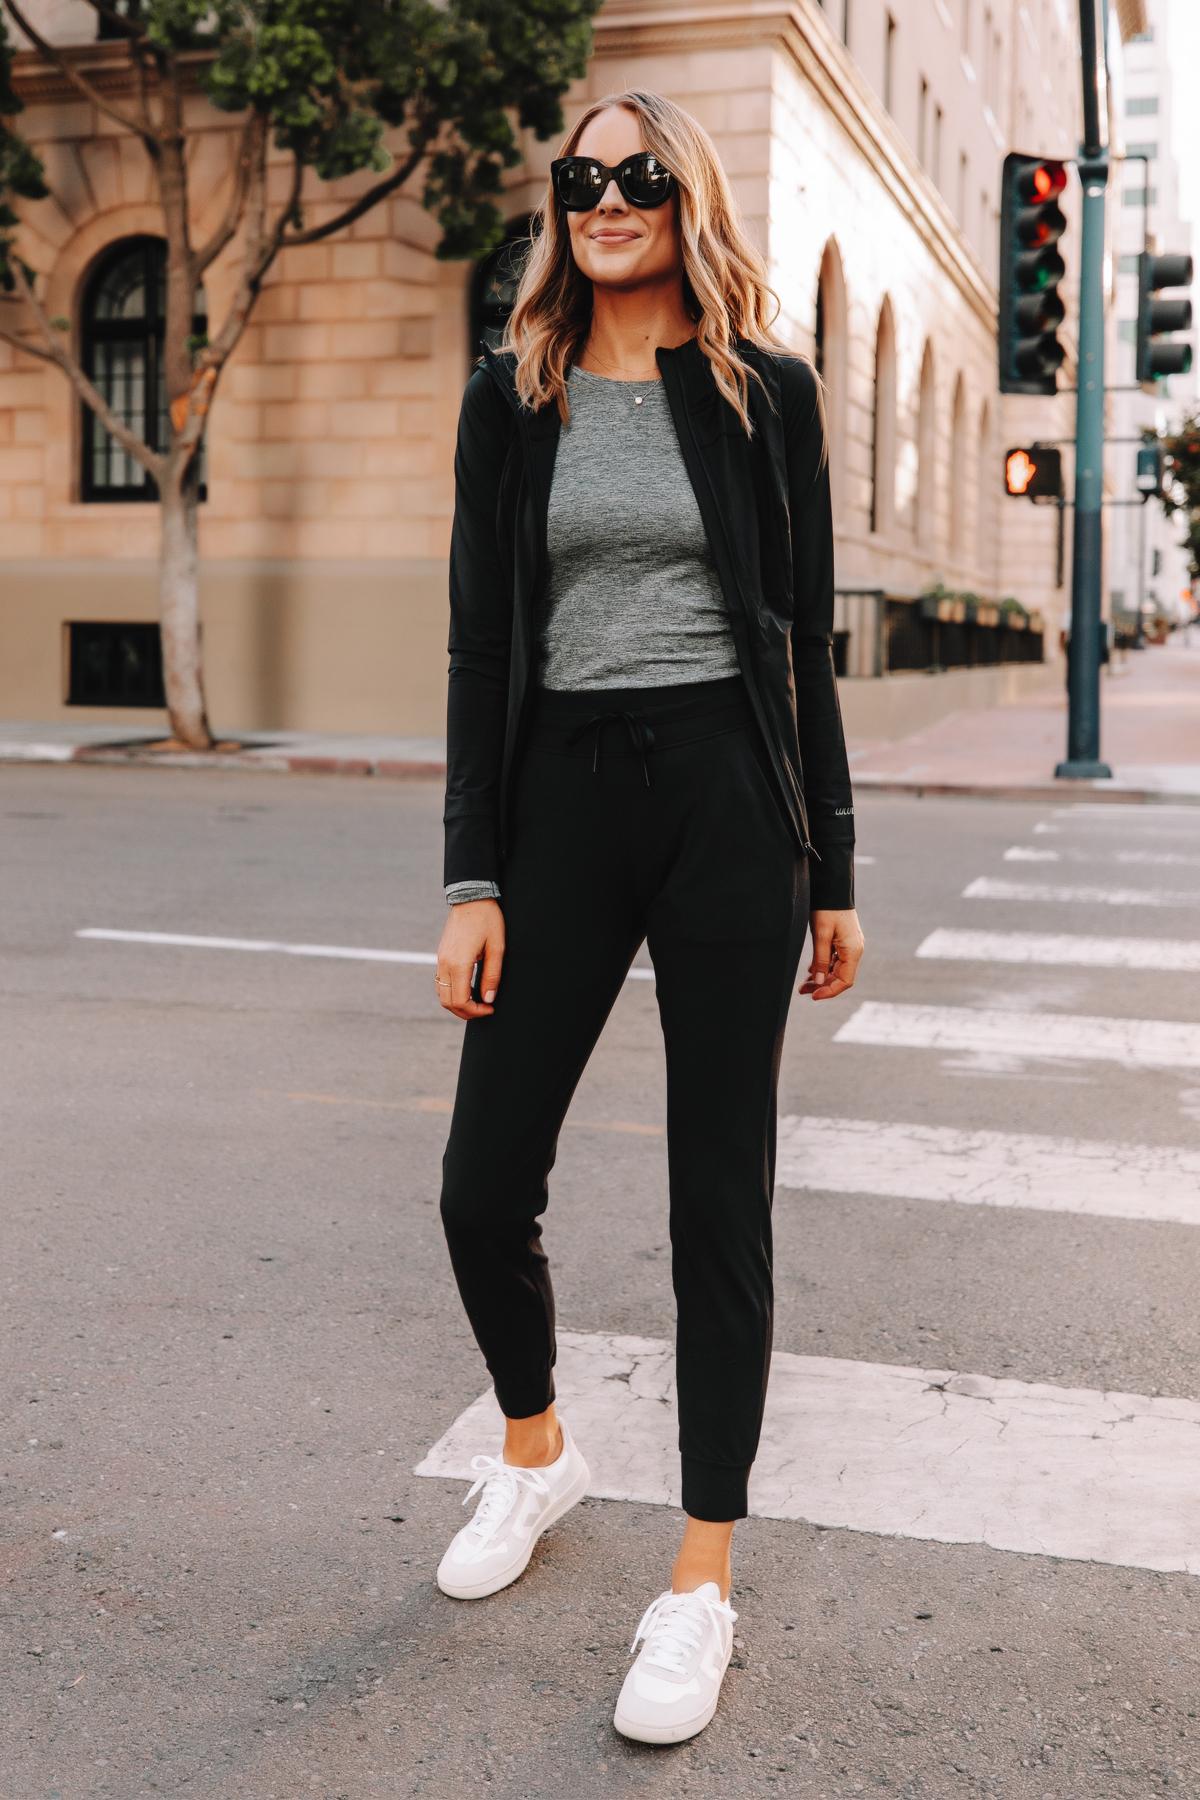 Fashion Jackson Wearing lululemon Ready to Rulu Black Joggers Veja Sneakers Black Jacket Grey Top 1